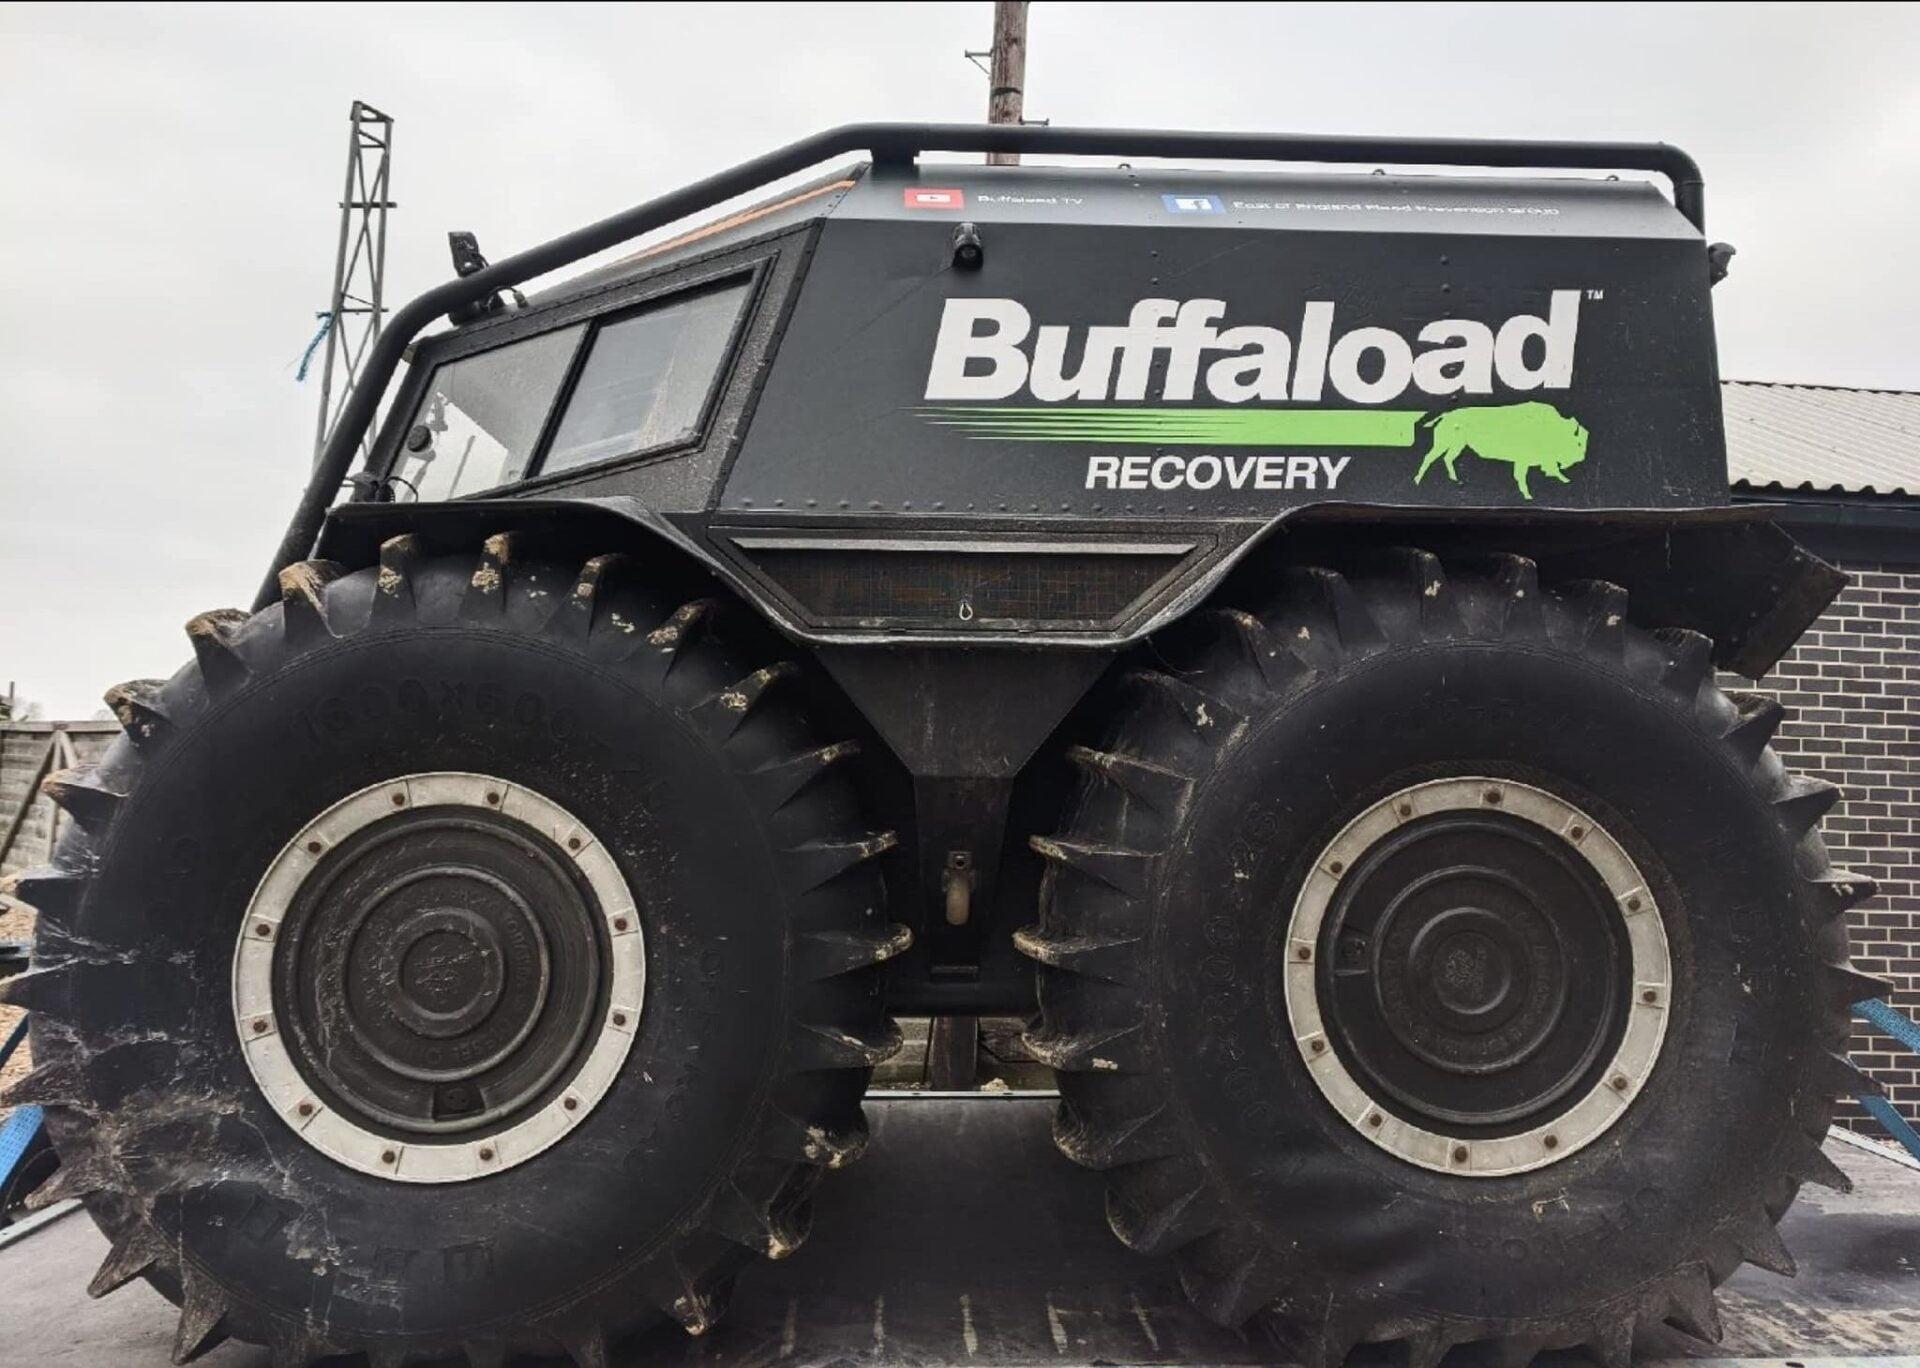 SHERP Pro 1000 for Buffaload Recovery